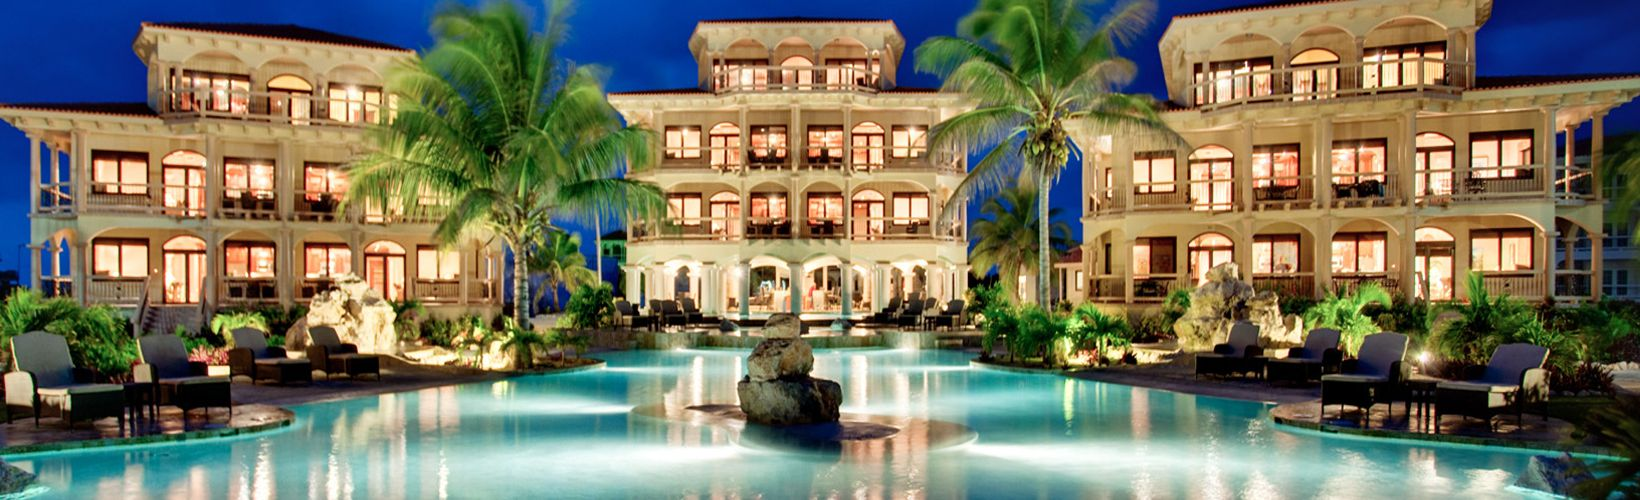 Coco Beach Resort Ambergris Caye Belize